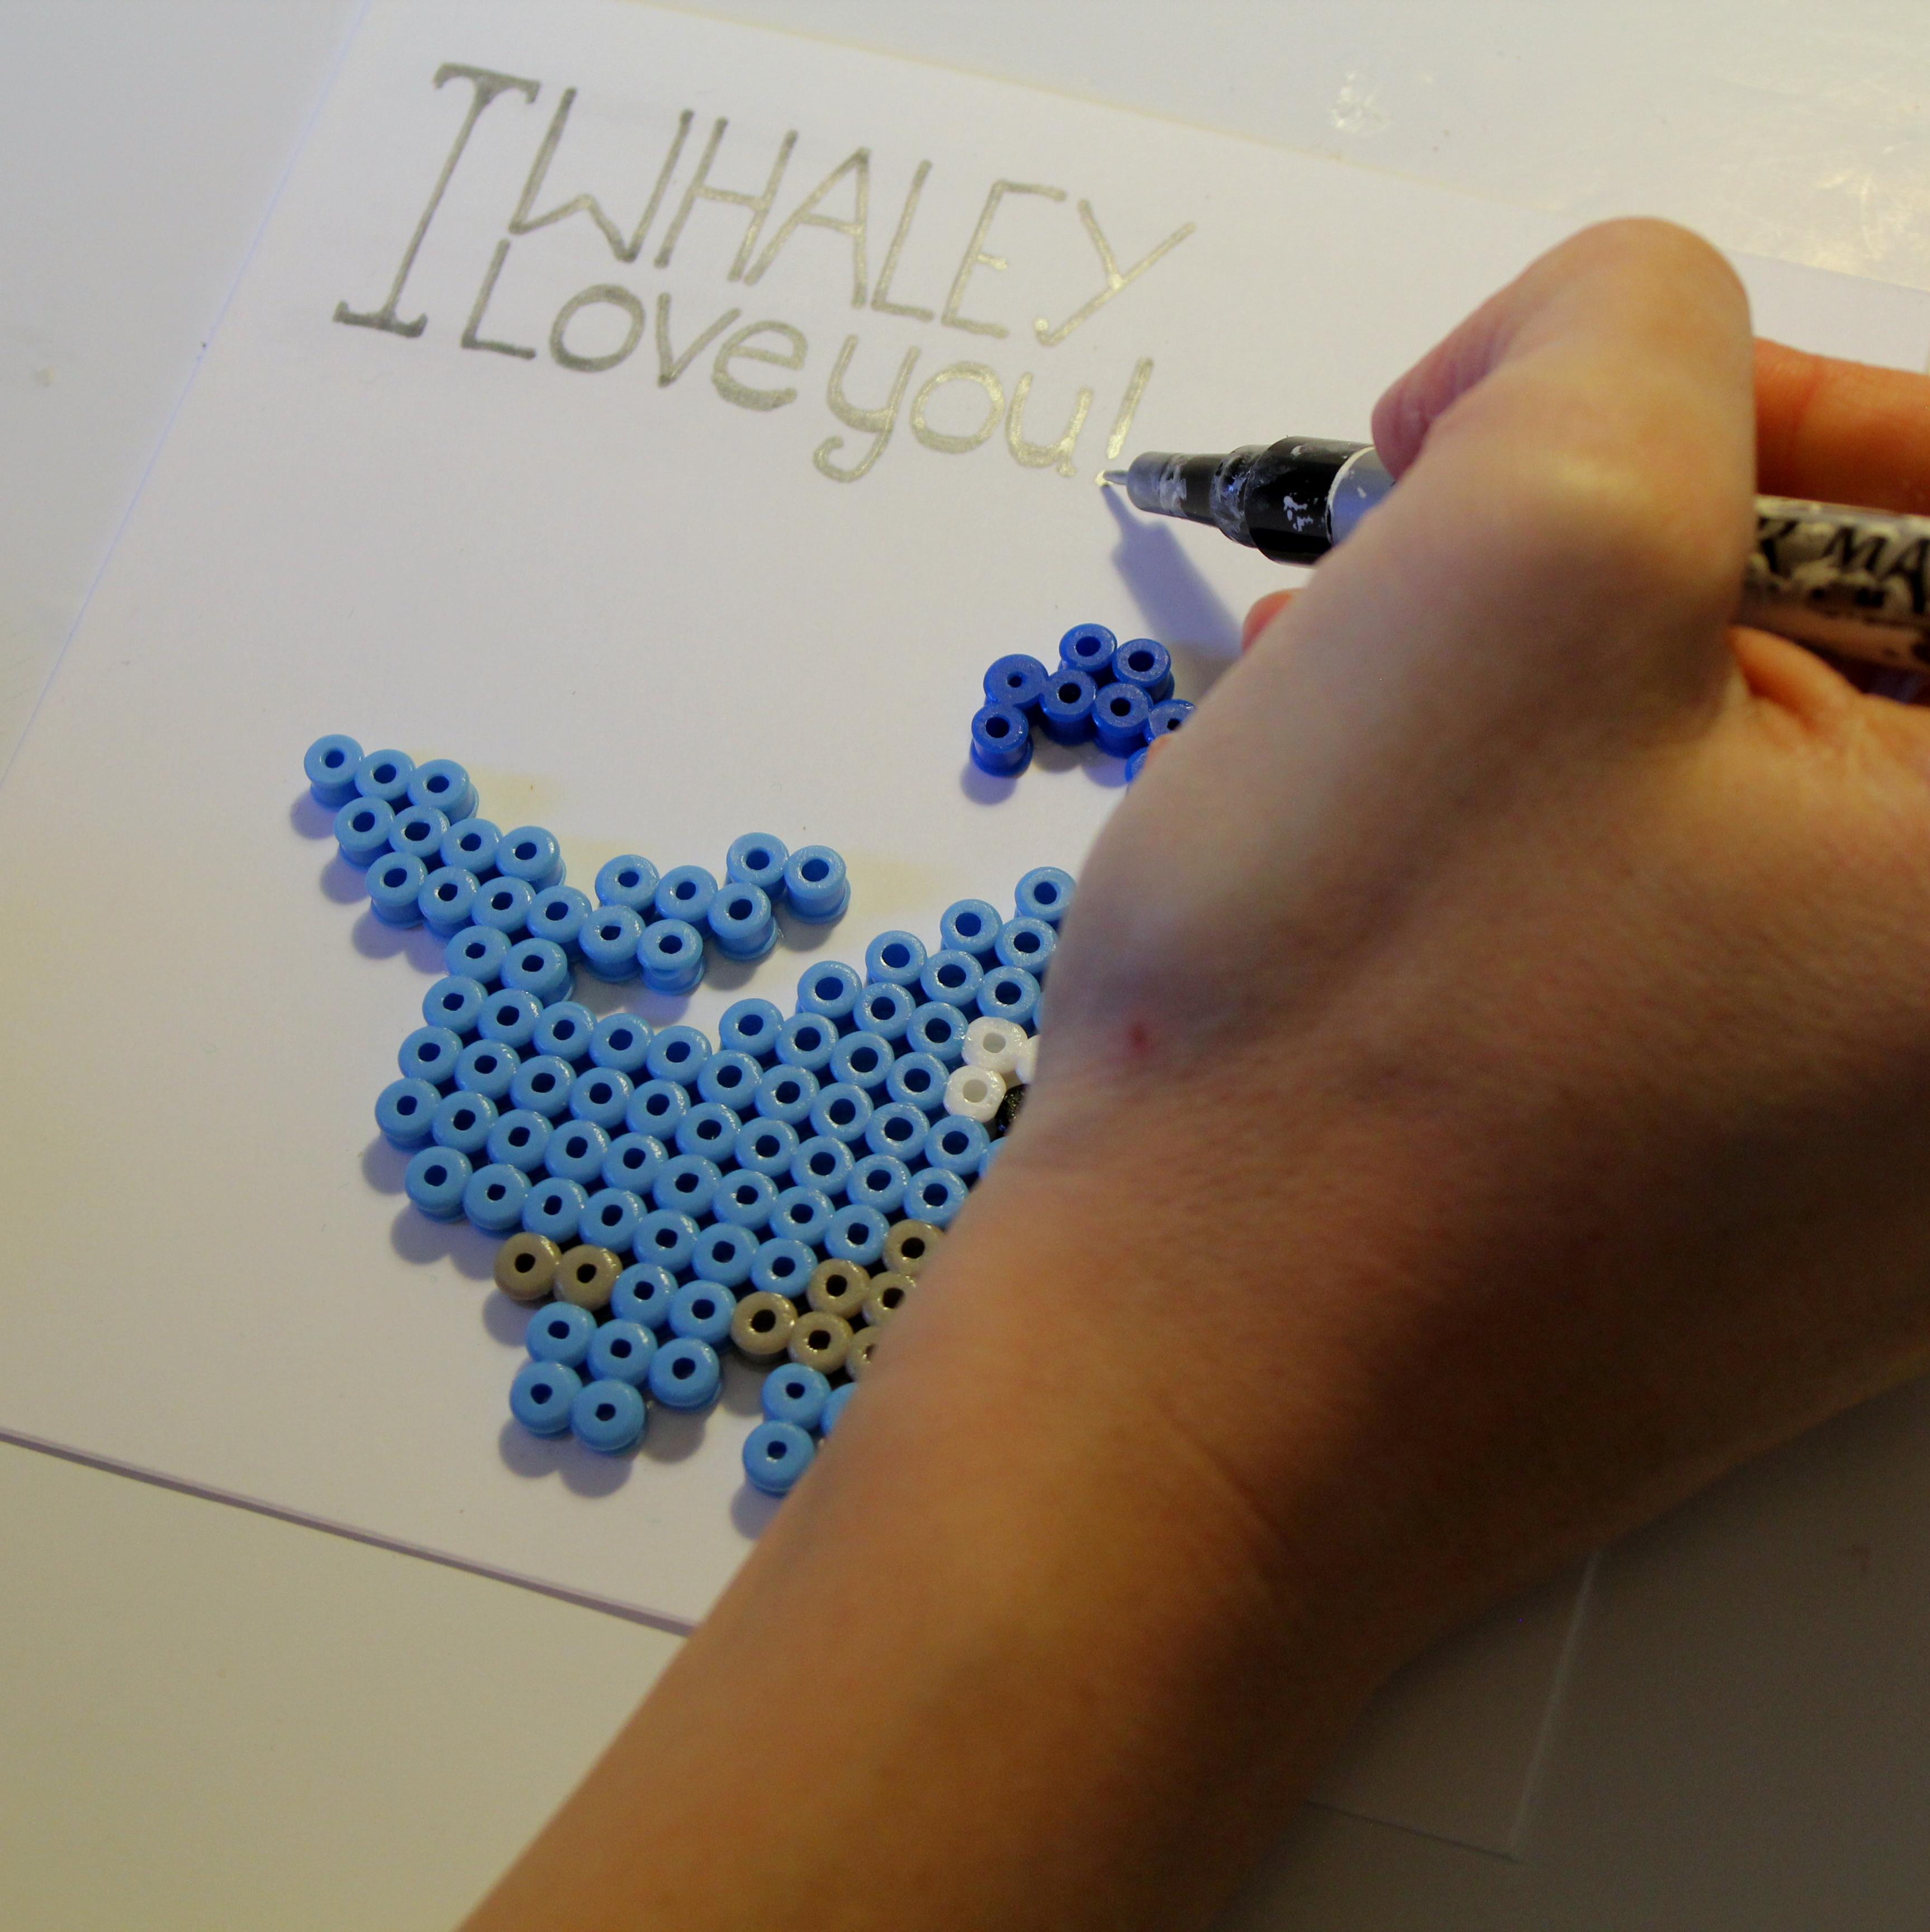 Papercraft Card Making Ideas Part - 50: 4 Easy Motheru0027s Day Card Ideas #Mothersday #CardMaking #Papercraft  #KidsCraft #Whale